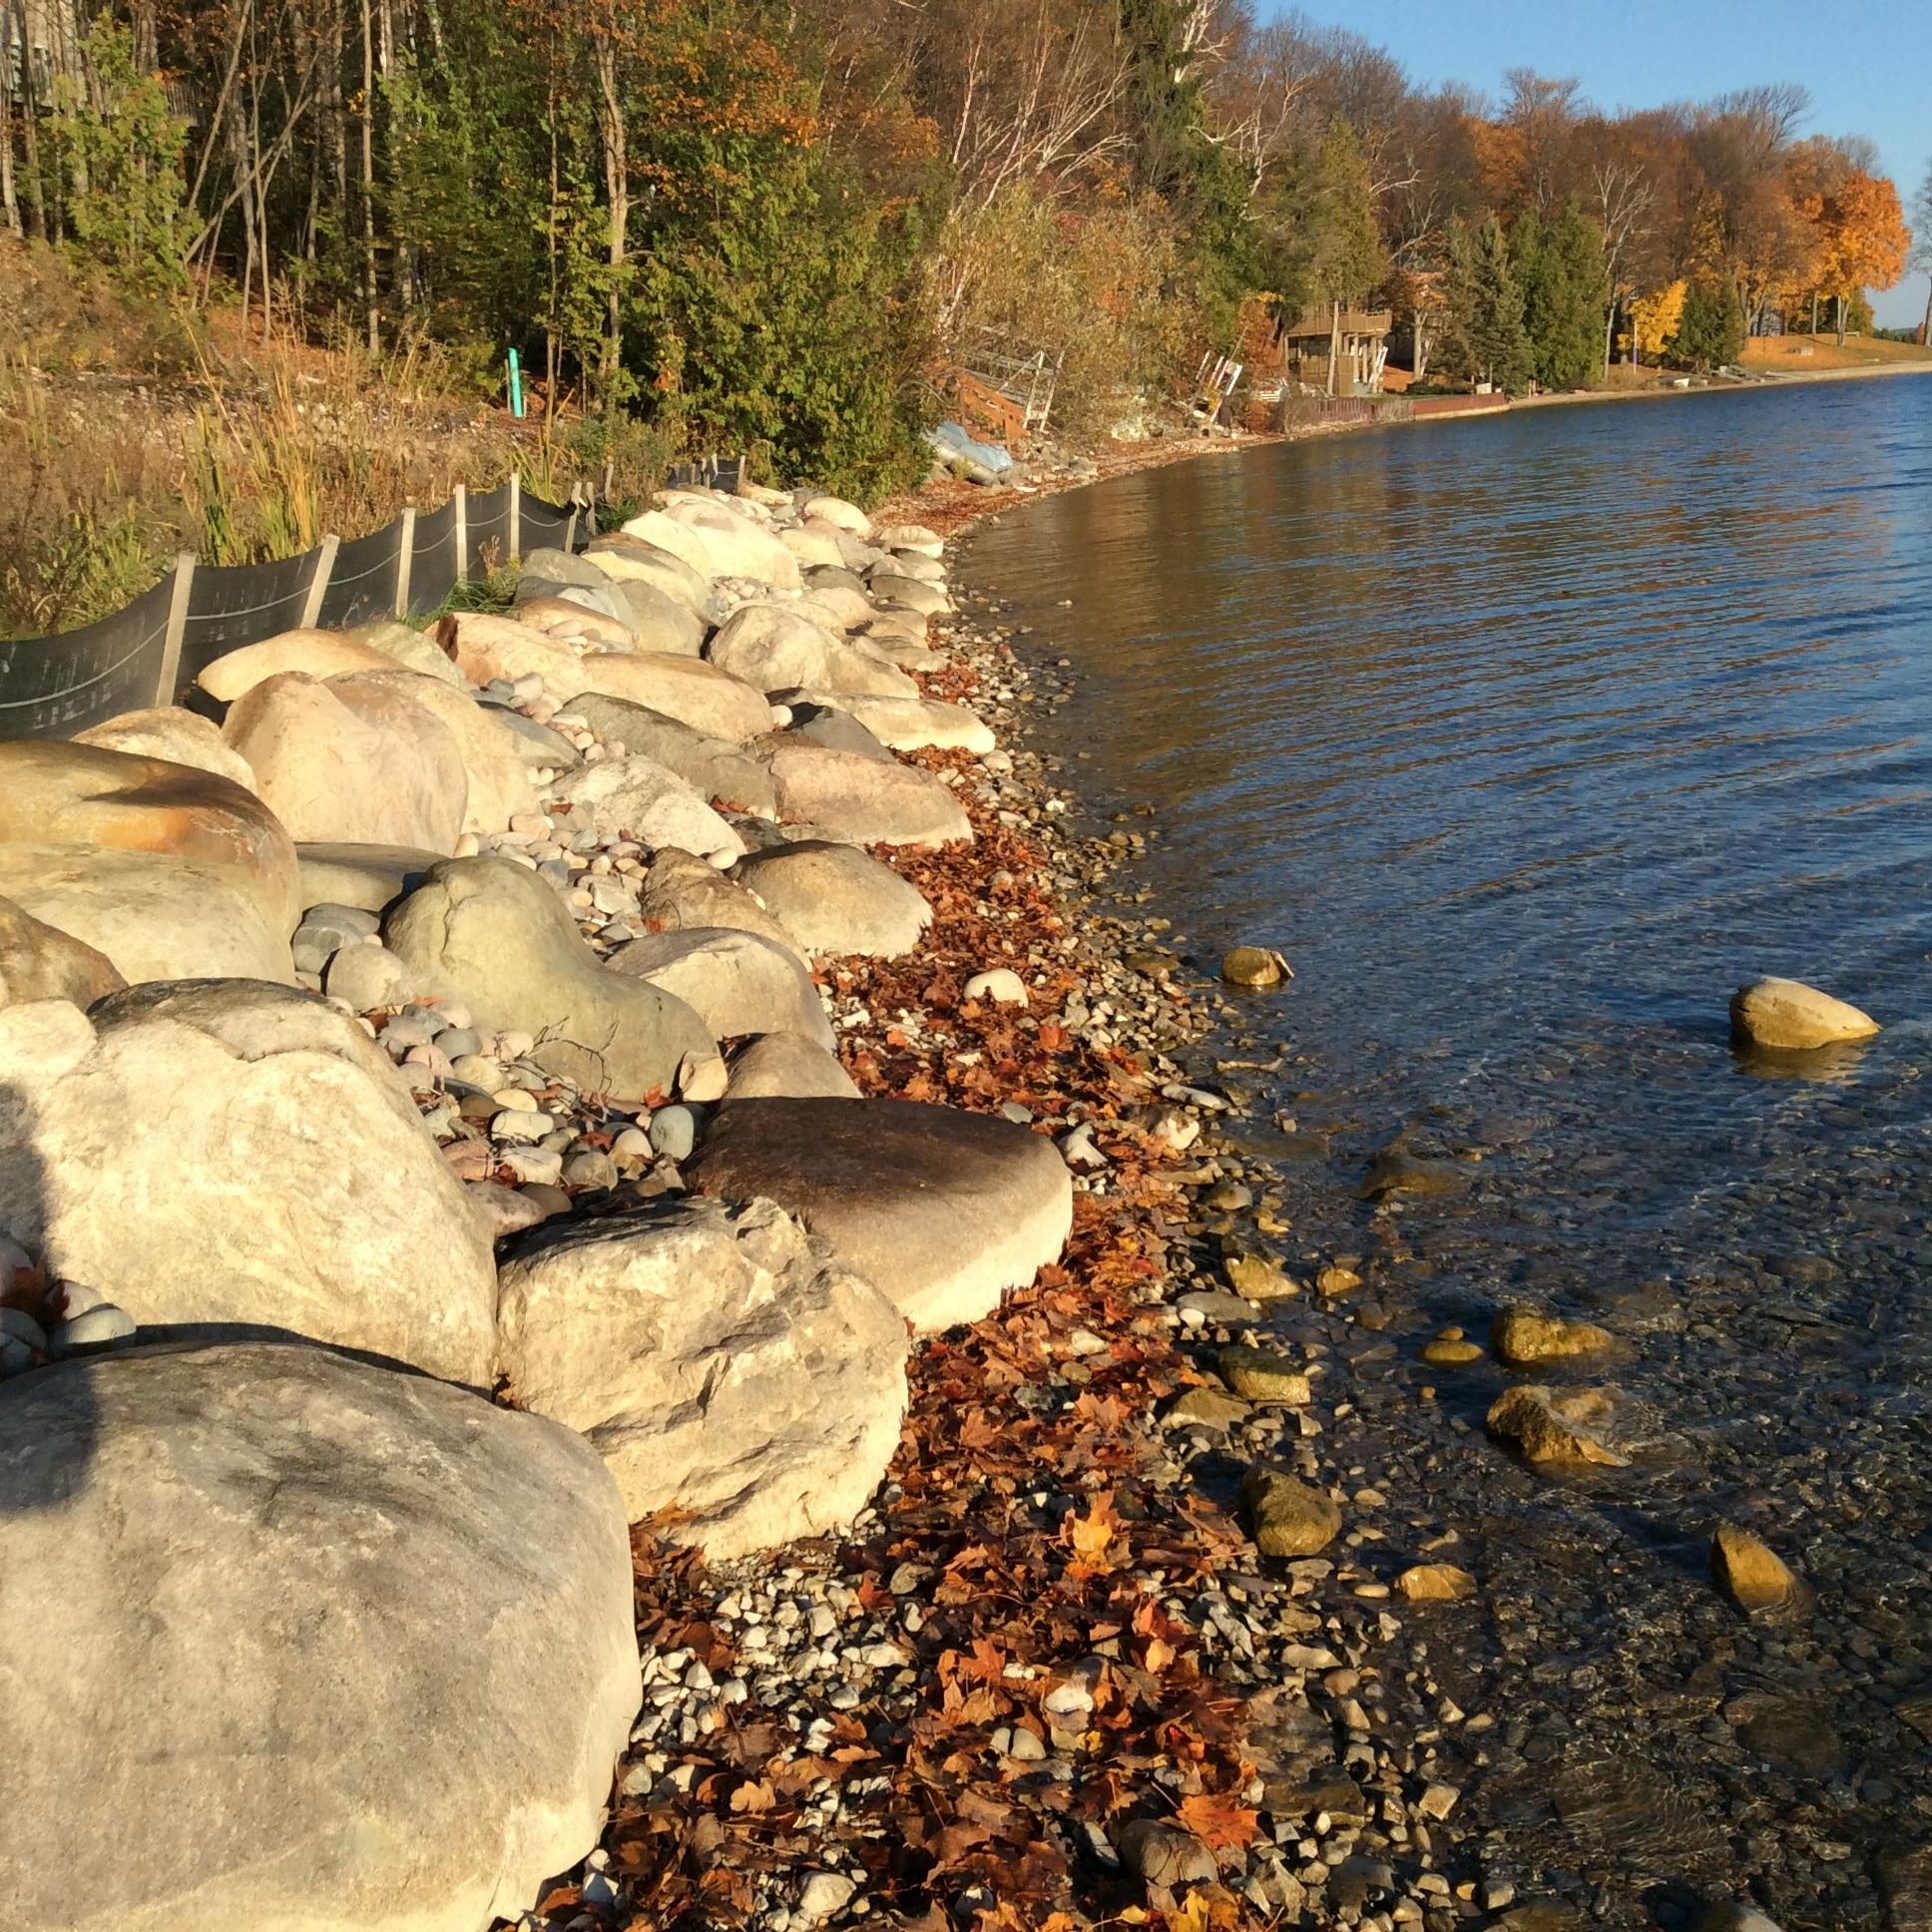 lake shore landscape installation prevents erosion and looks goreous